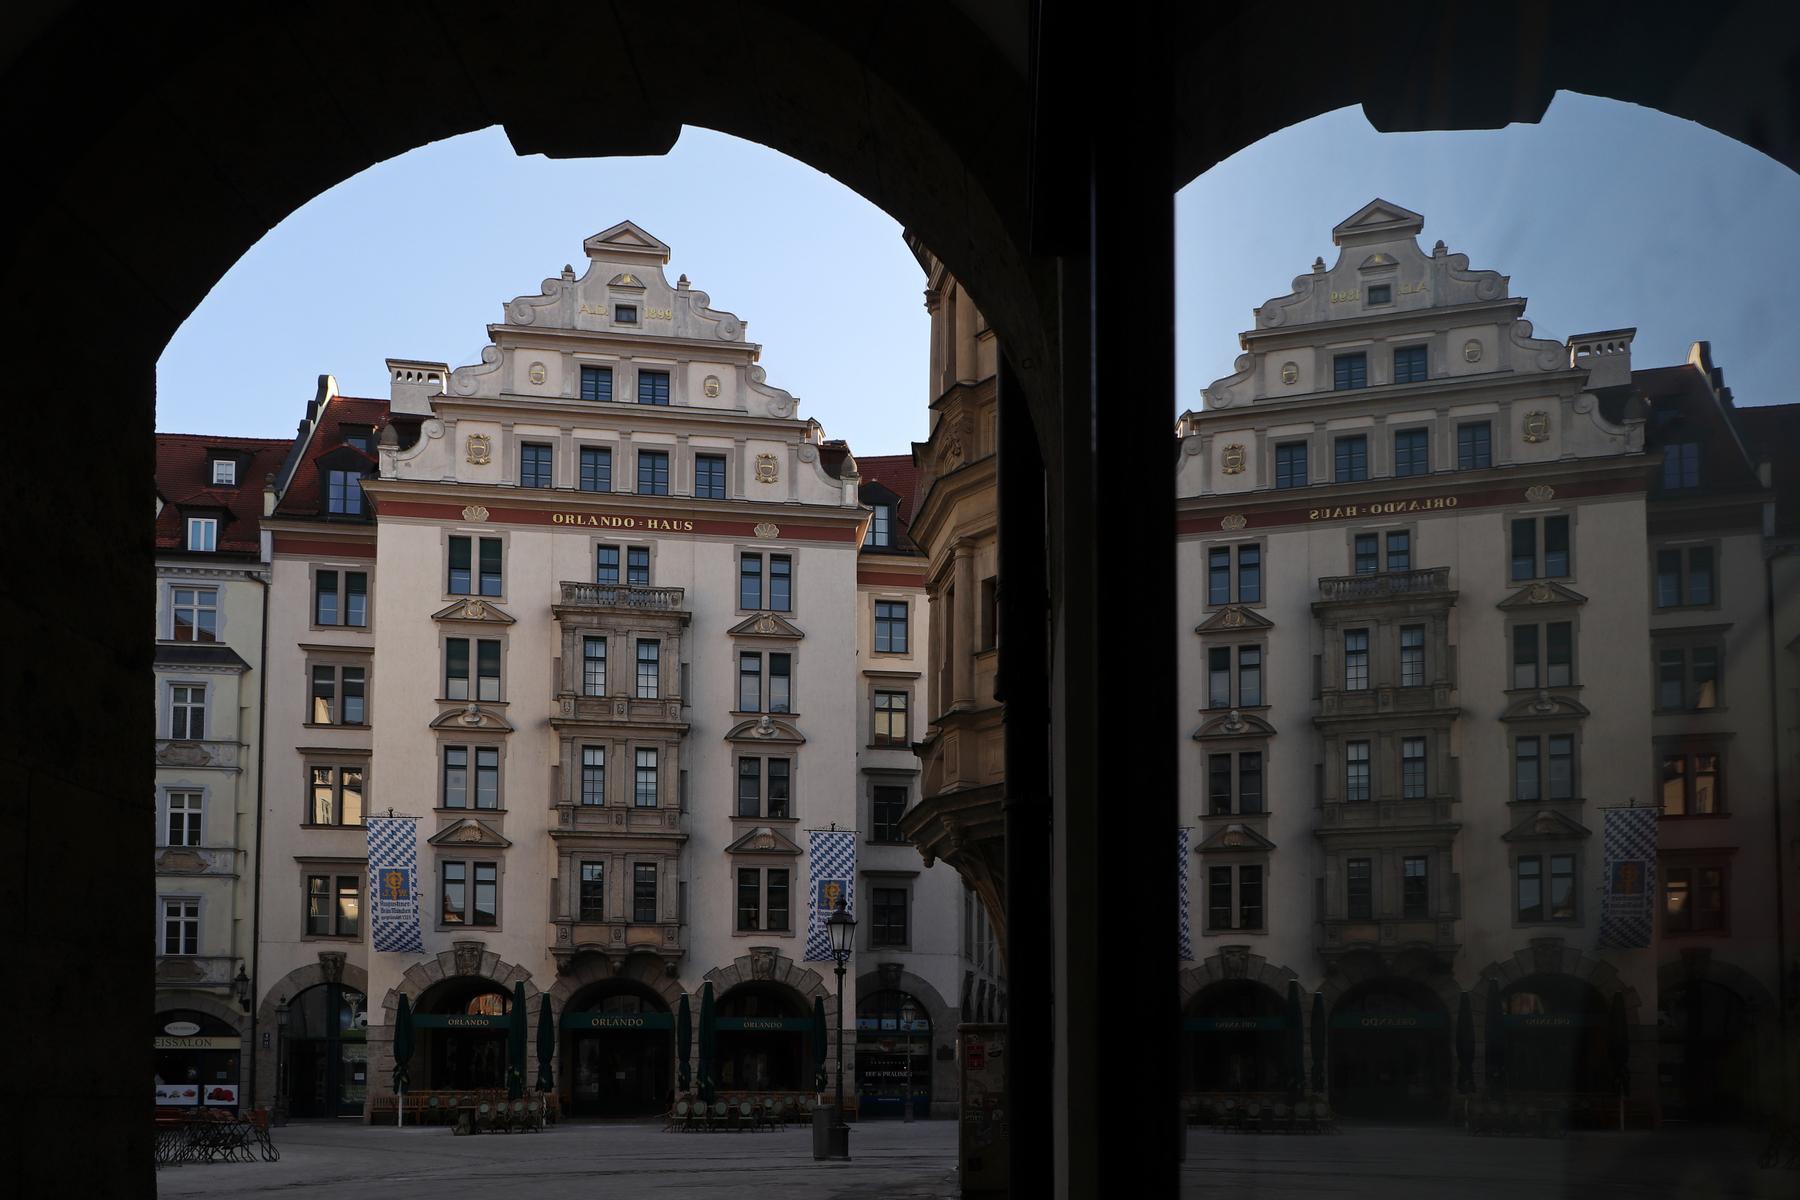 Morgens am Platzl in München